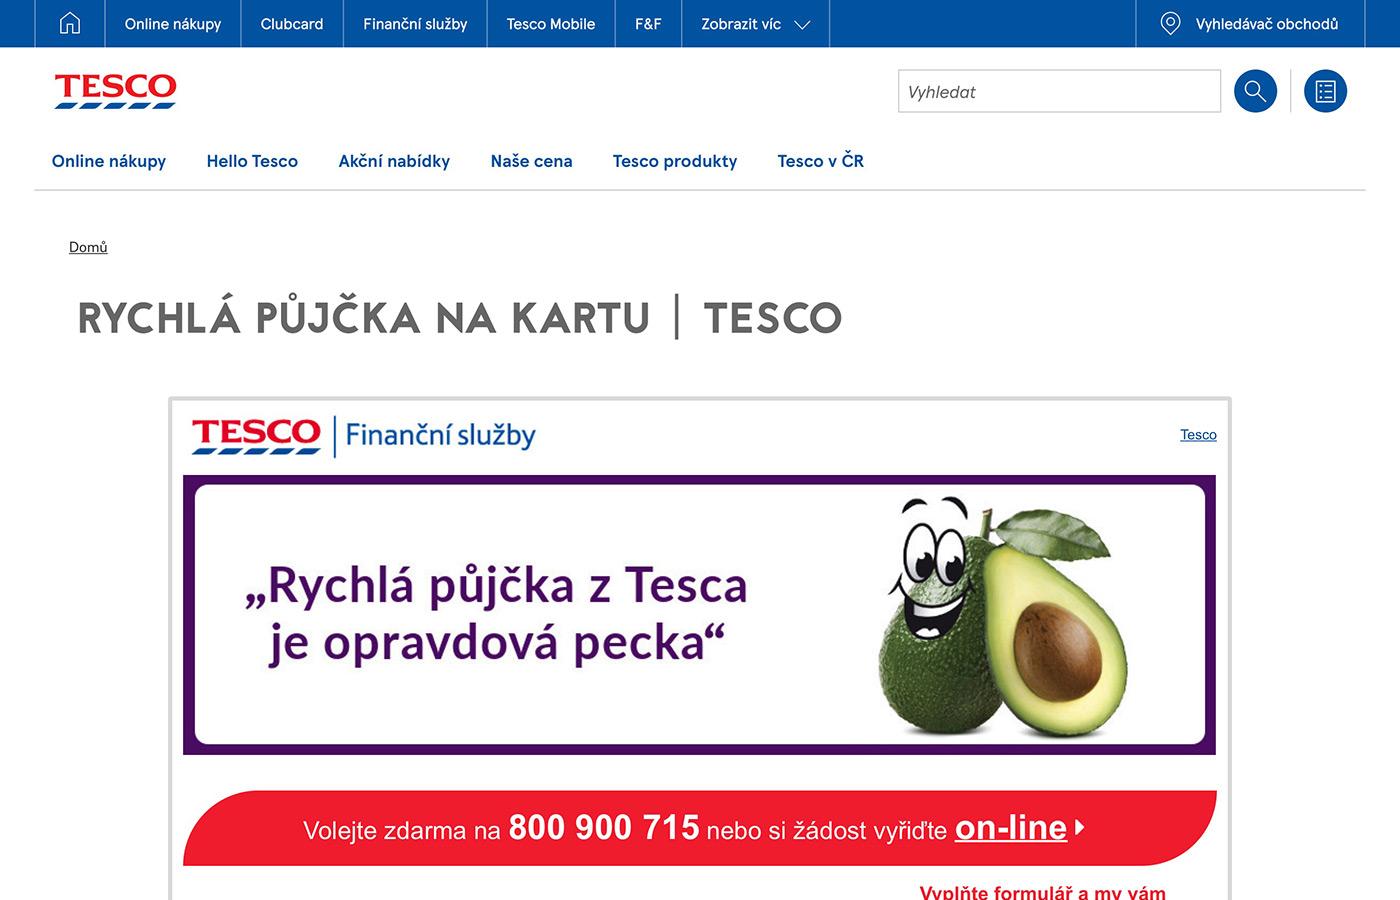 Tesco půjčka až 250 000 Kč s rozumným úrokem - OKfin.cz.